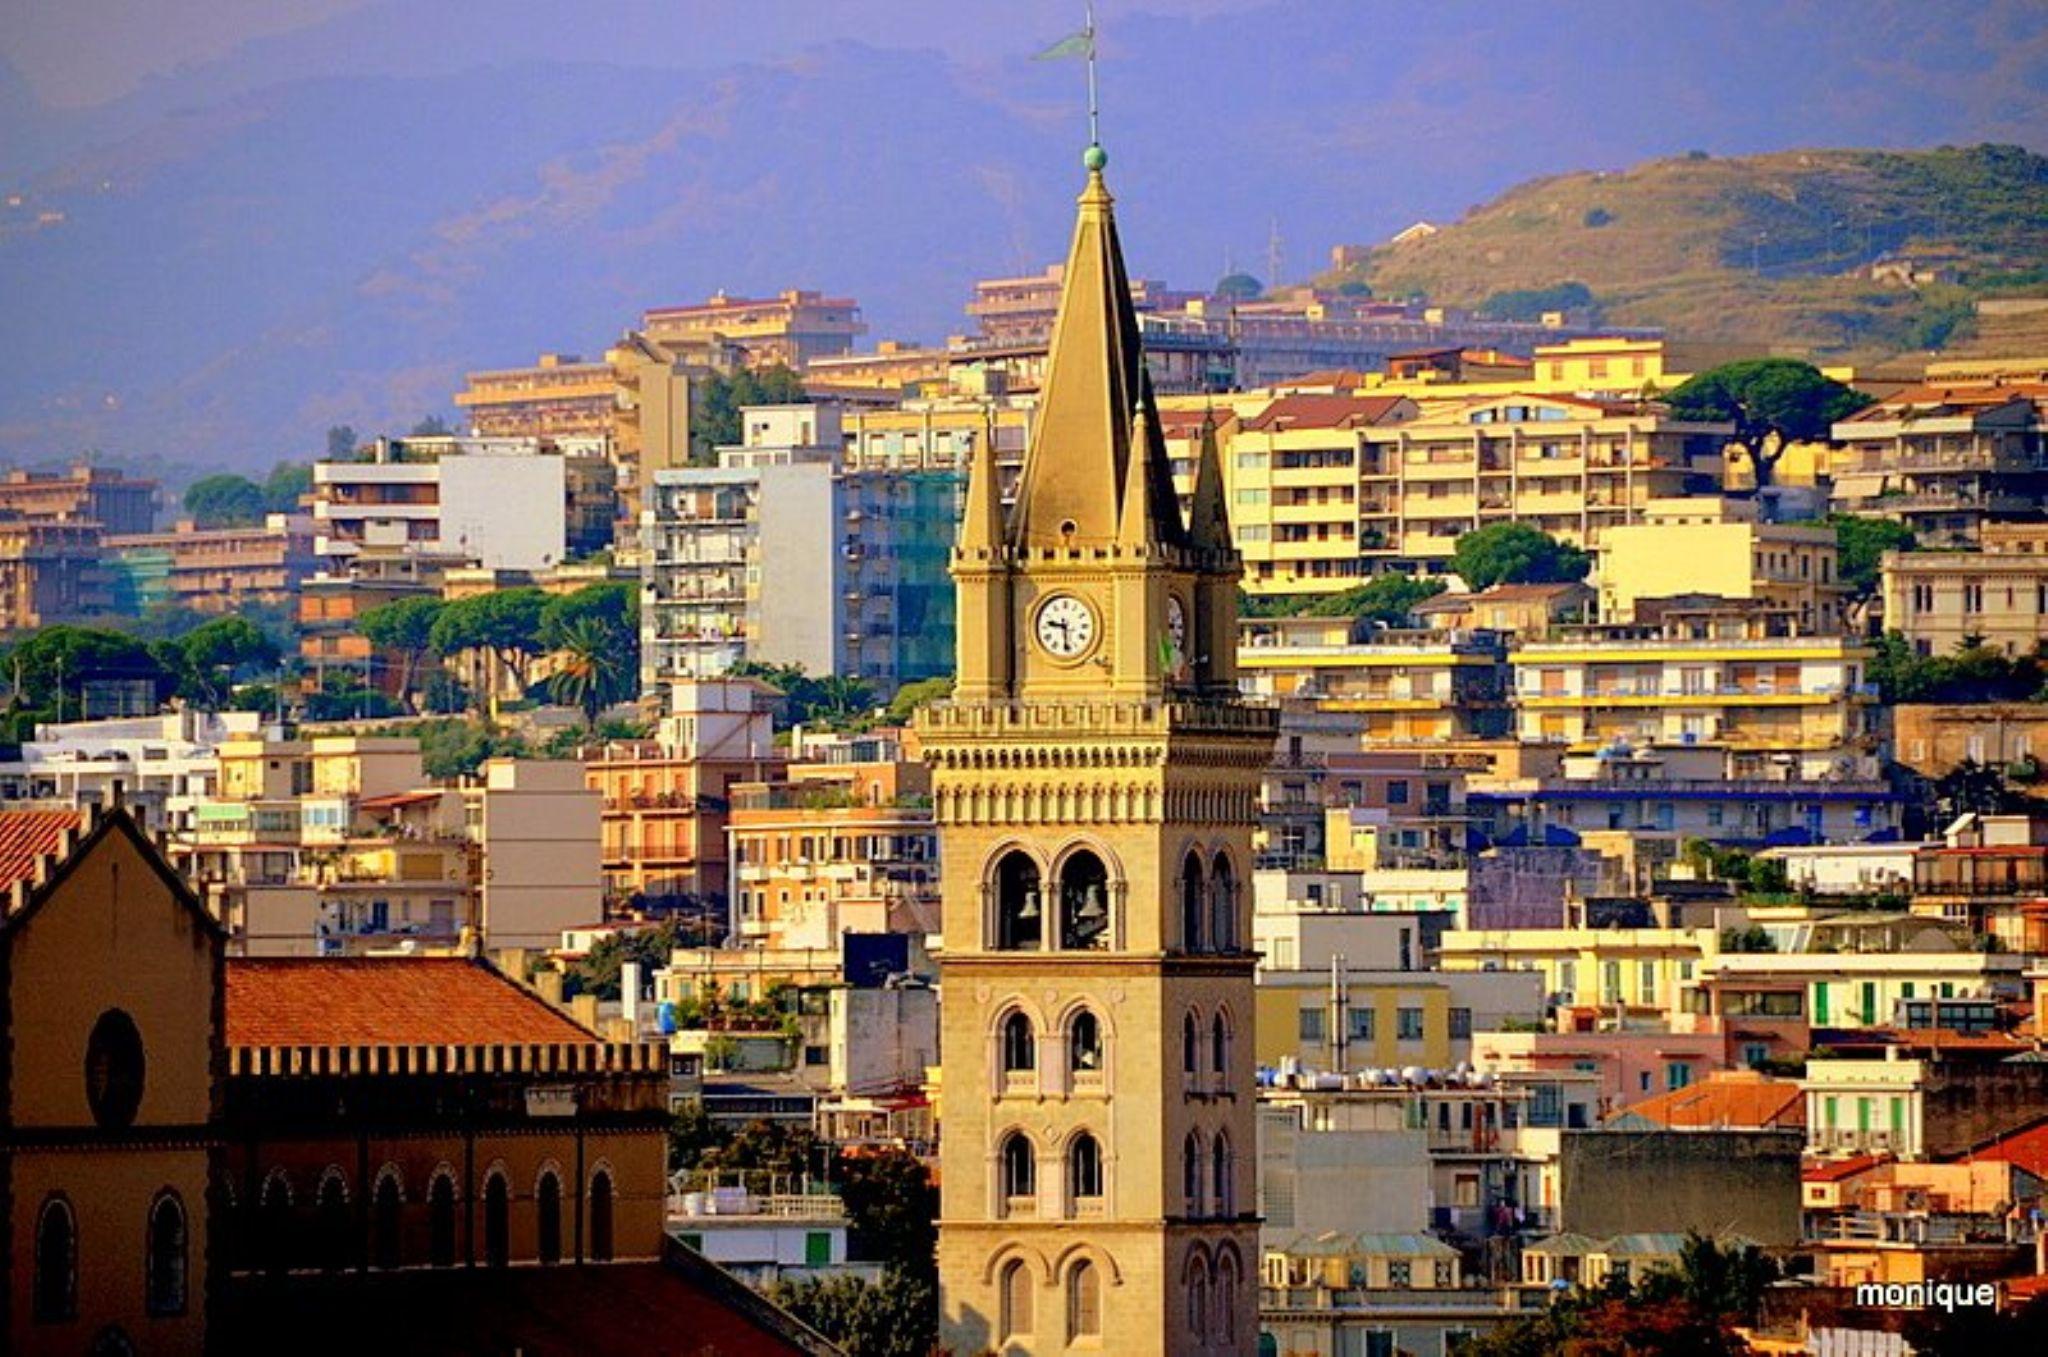 Sorrento Italy by monique222